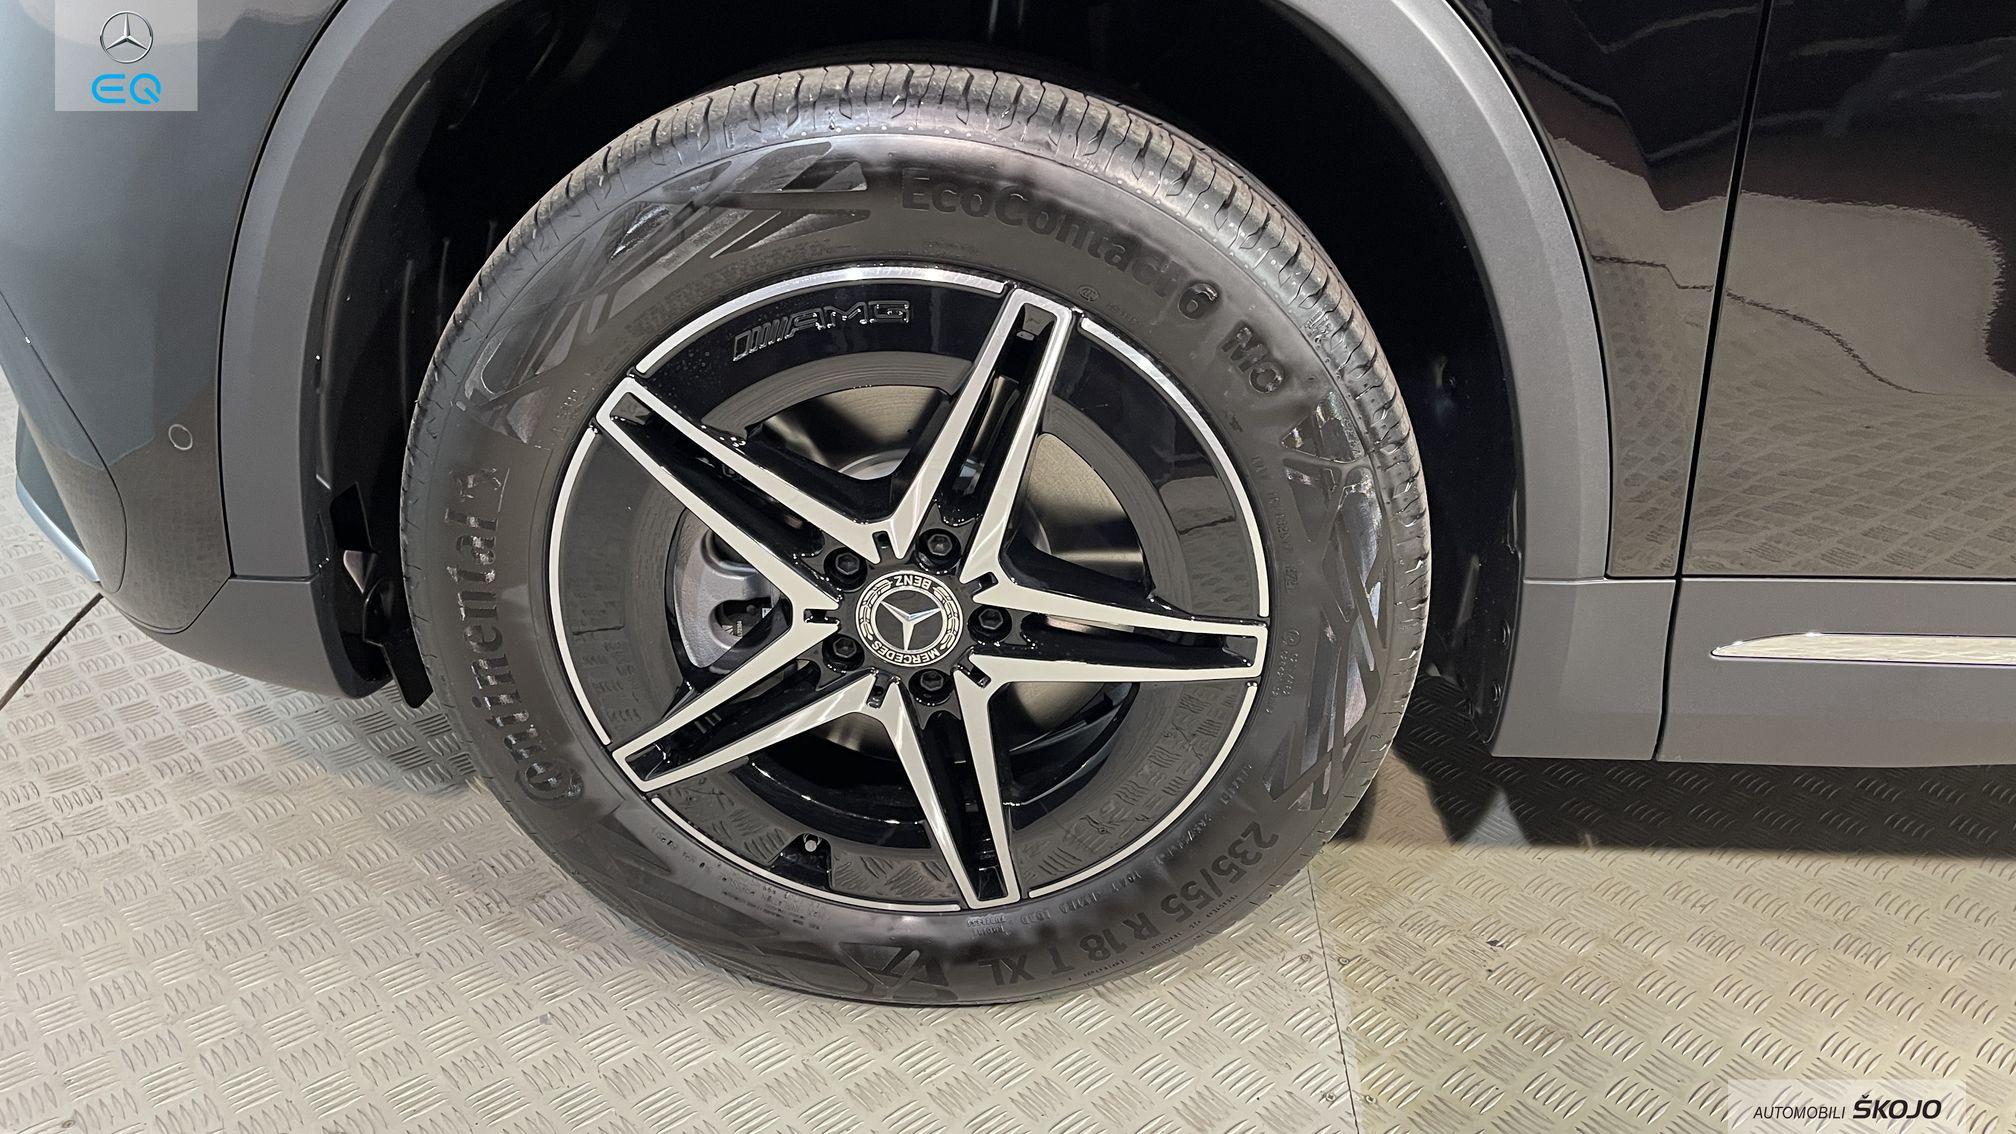 Mercedes-Benz_Škojo_18